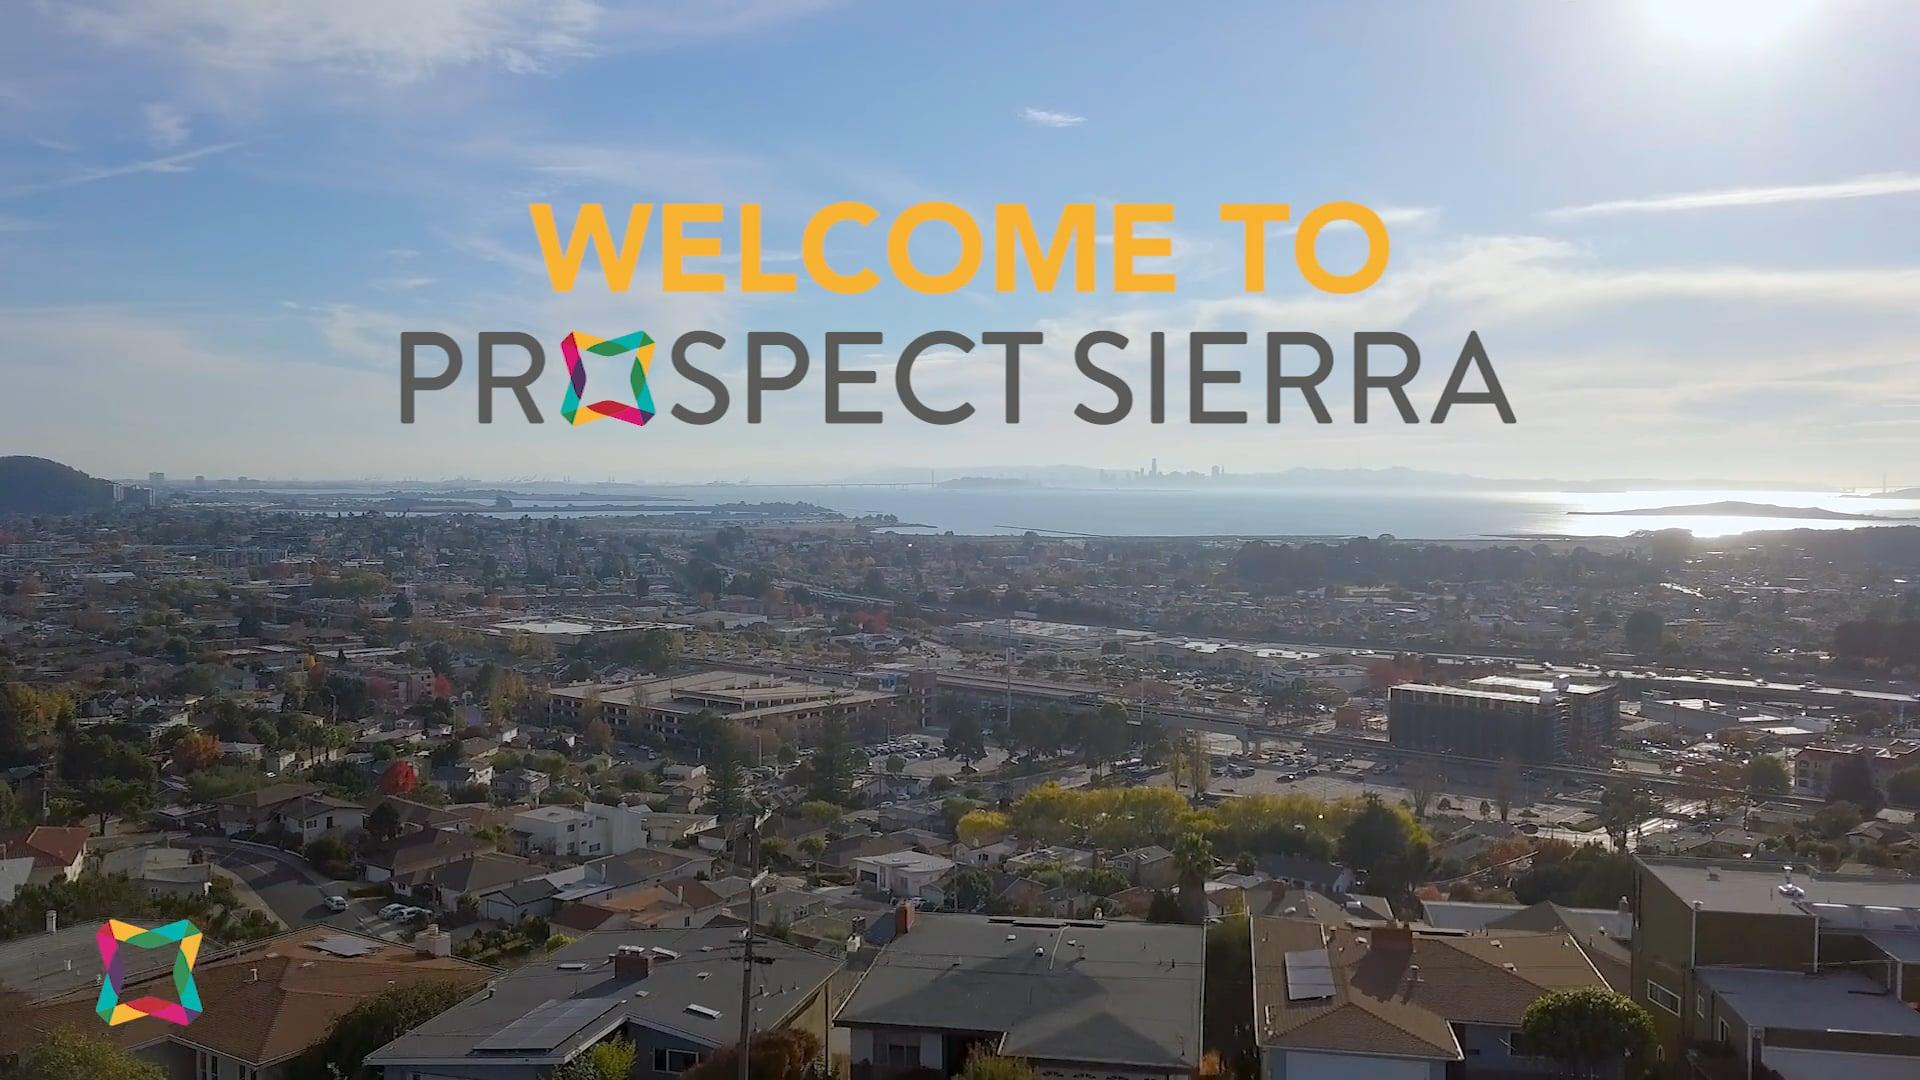 Prospect Sierra